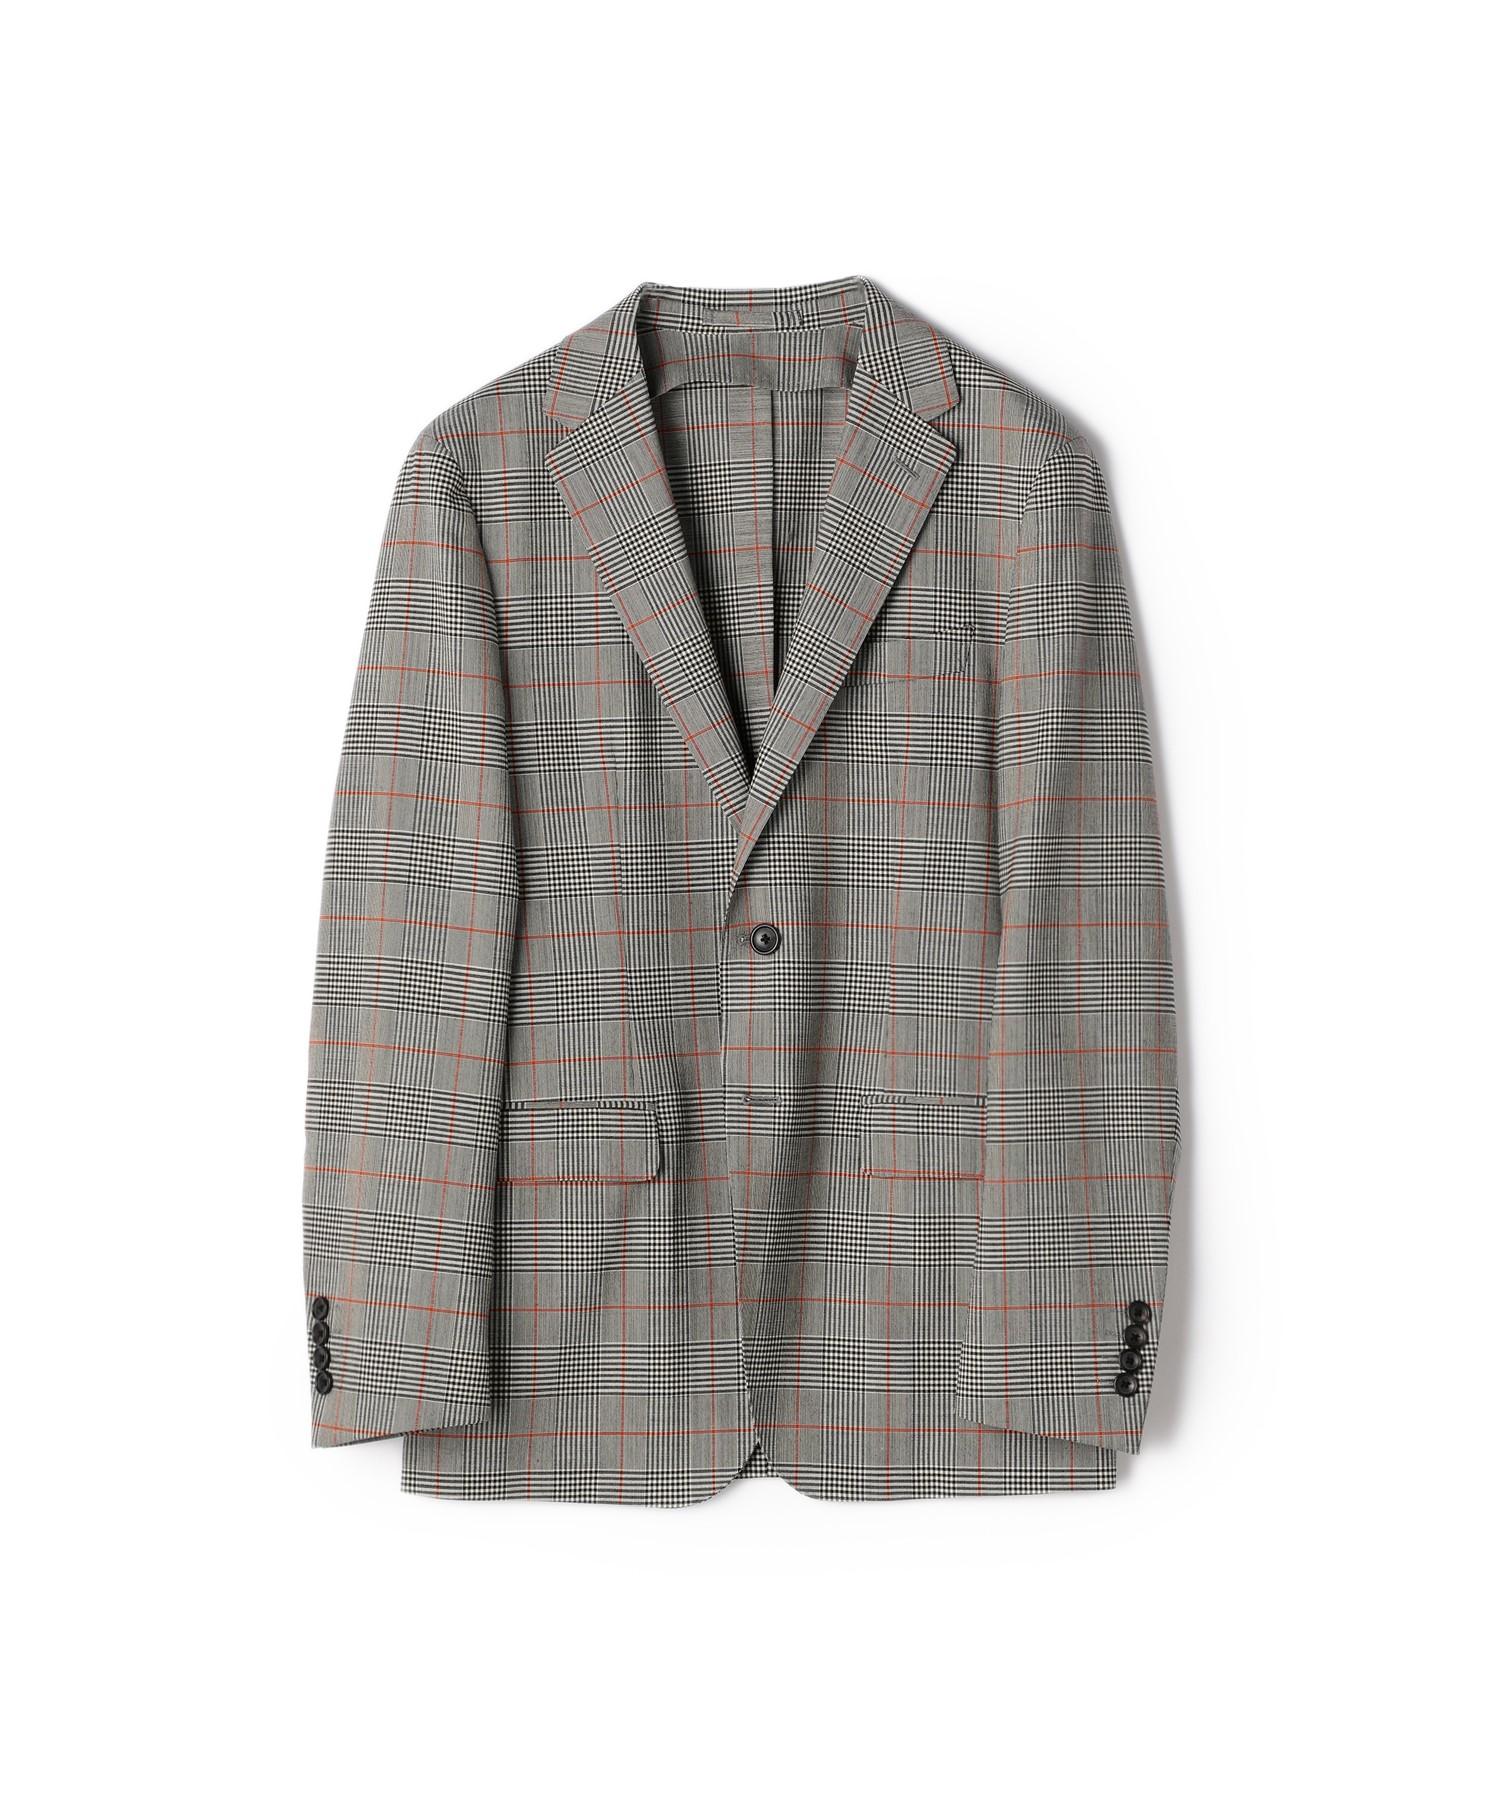 ESTNATION / グレンチェック柄ストレッチウールジャケット